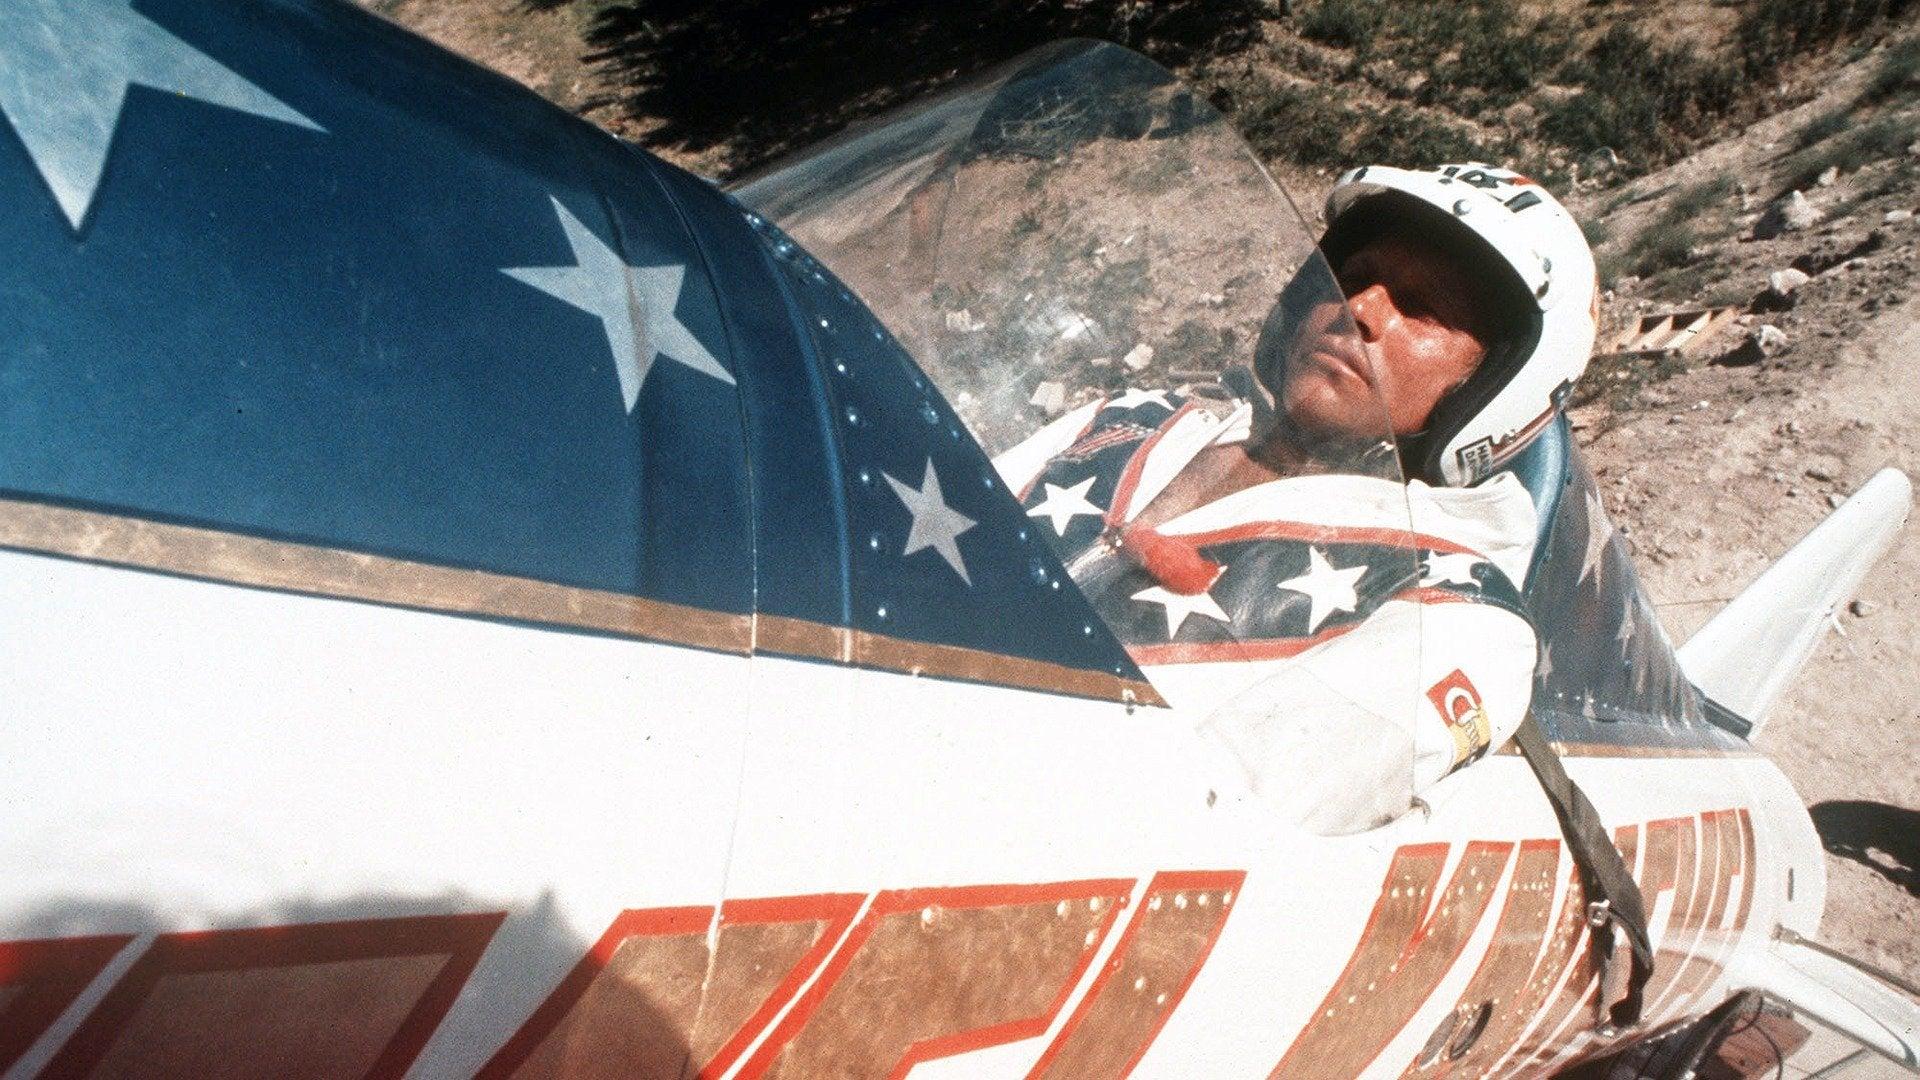 Pure Evel: American Legend